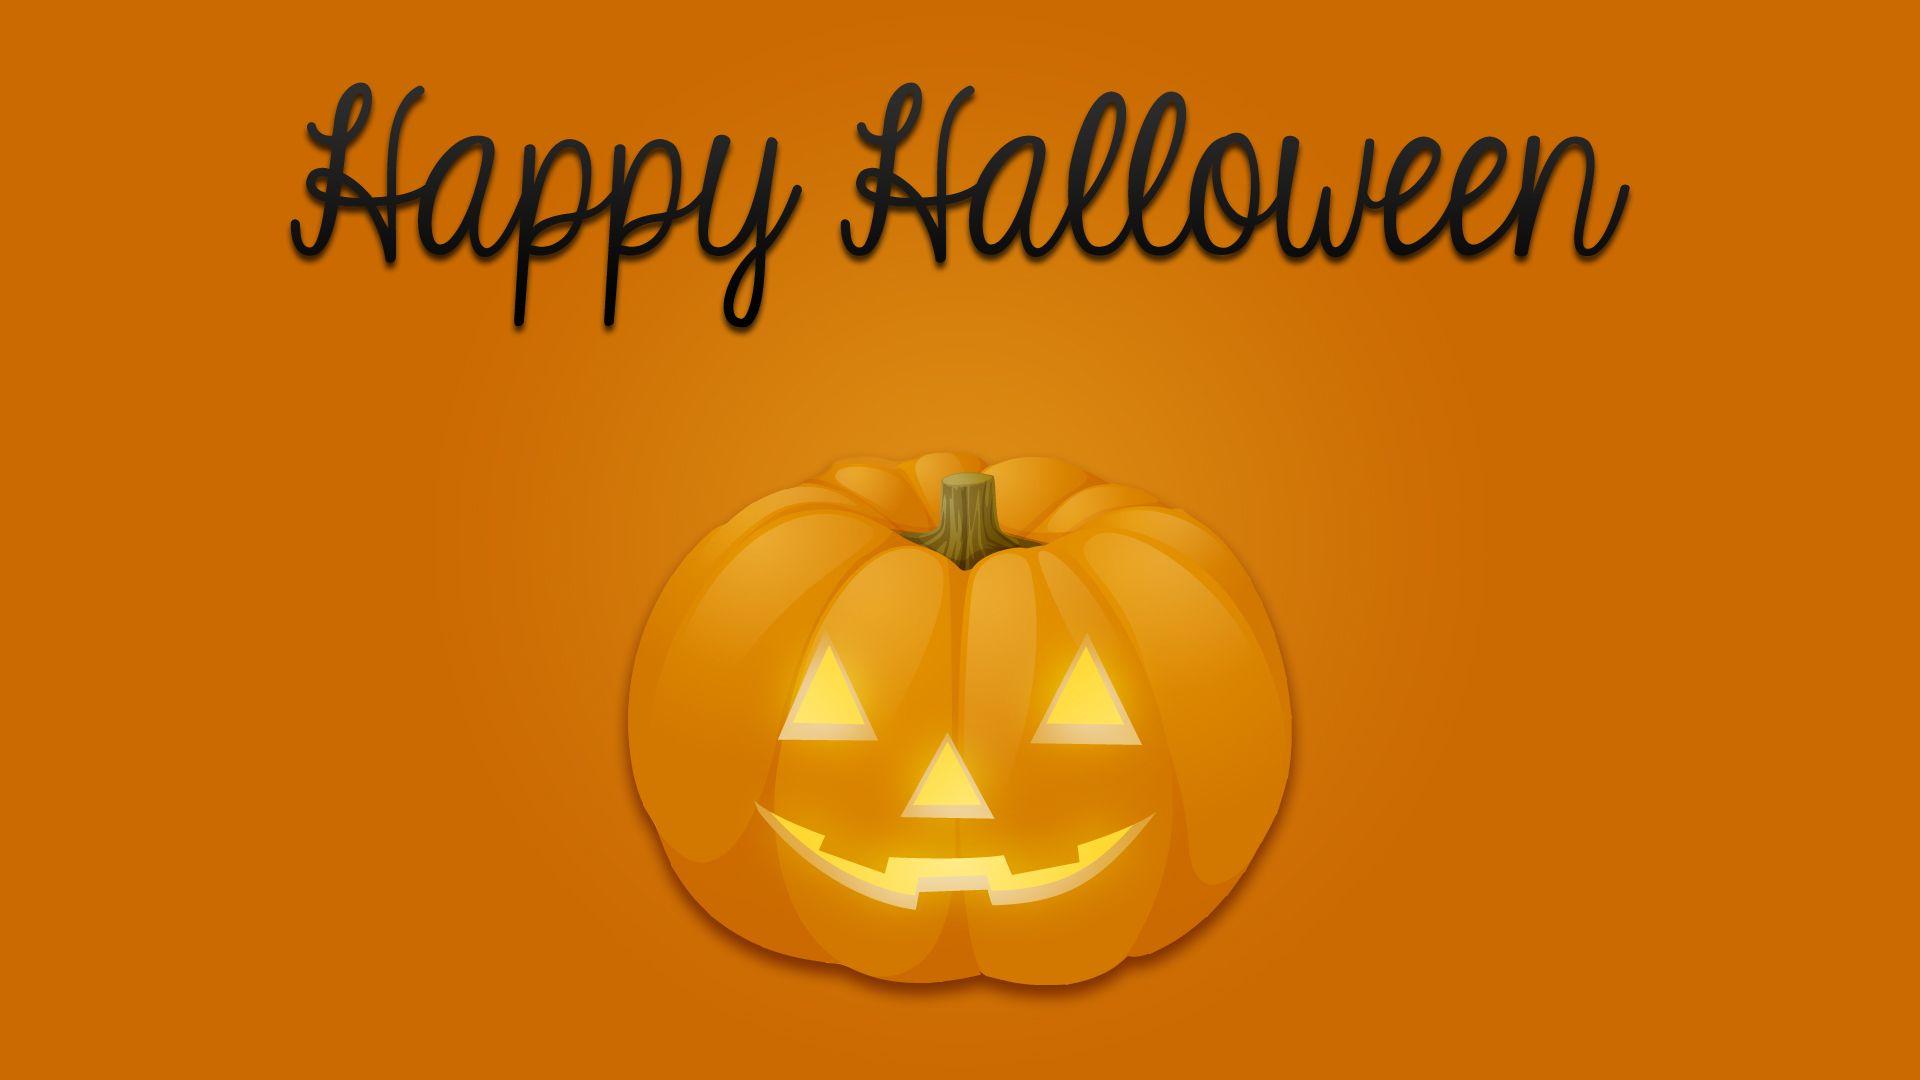 Happy Halloween Pumpkin Wallpaper 1920x1080 By  CupcakeyKitten.deviantart.com On @DeviantArt